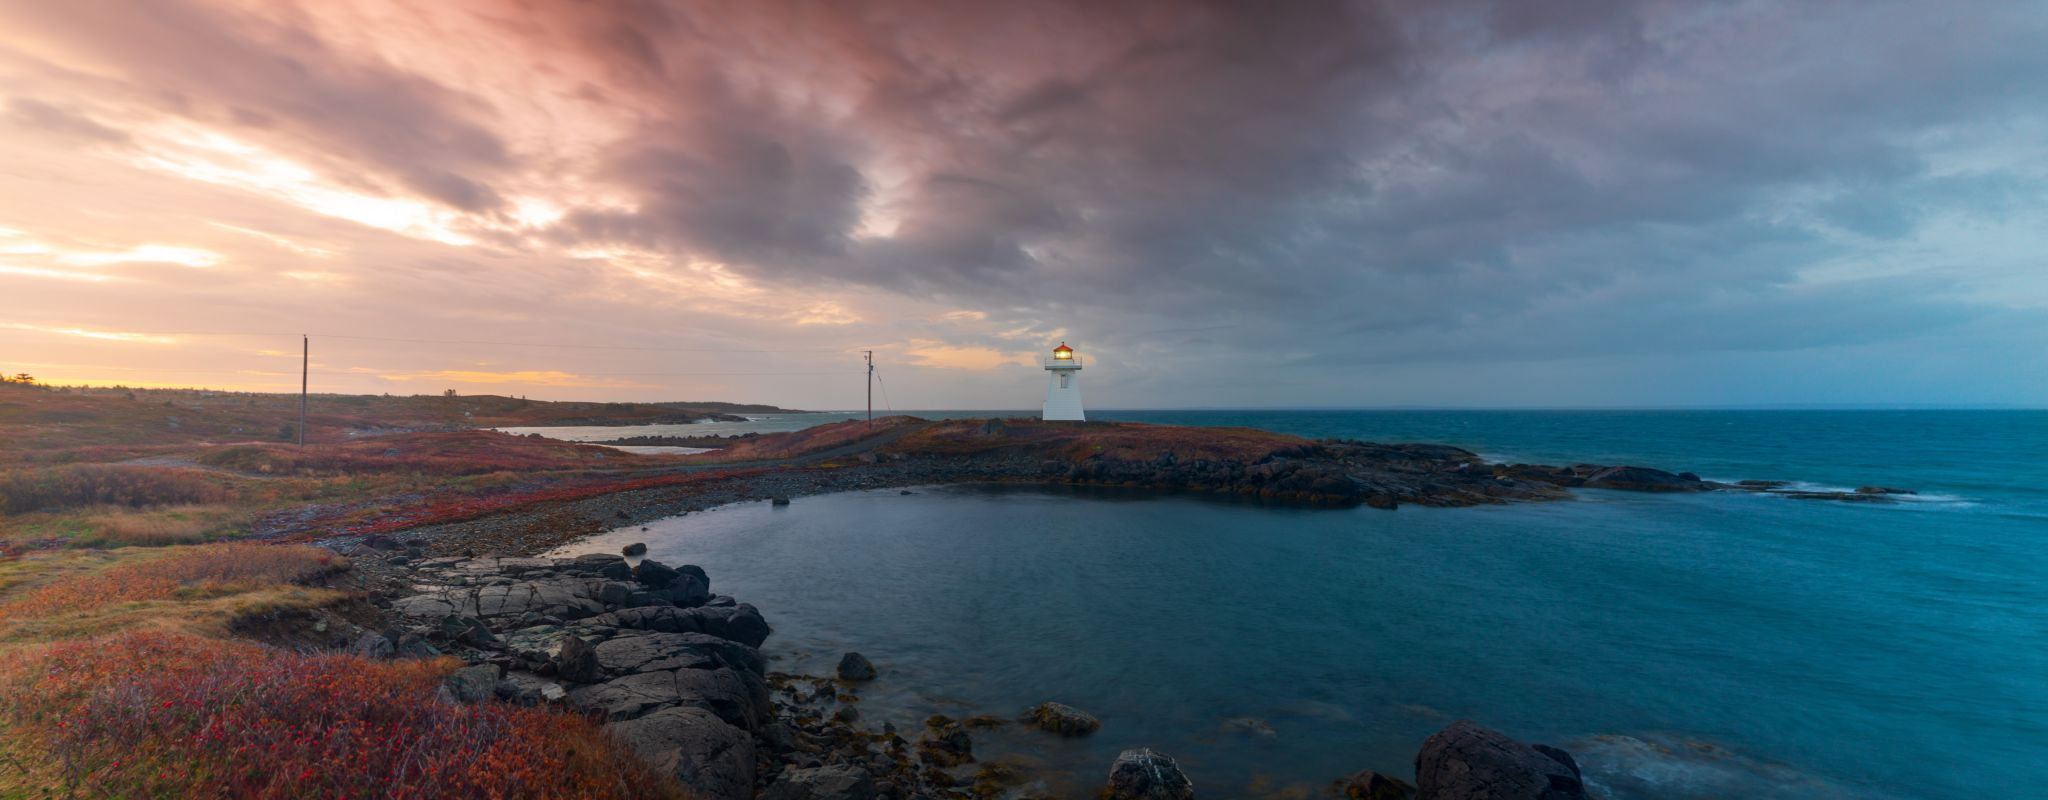 Cap Auget Lighthouse, Isle Madame, Arichat, Nova Scotia, Canada